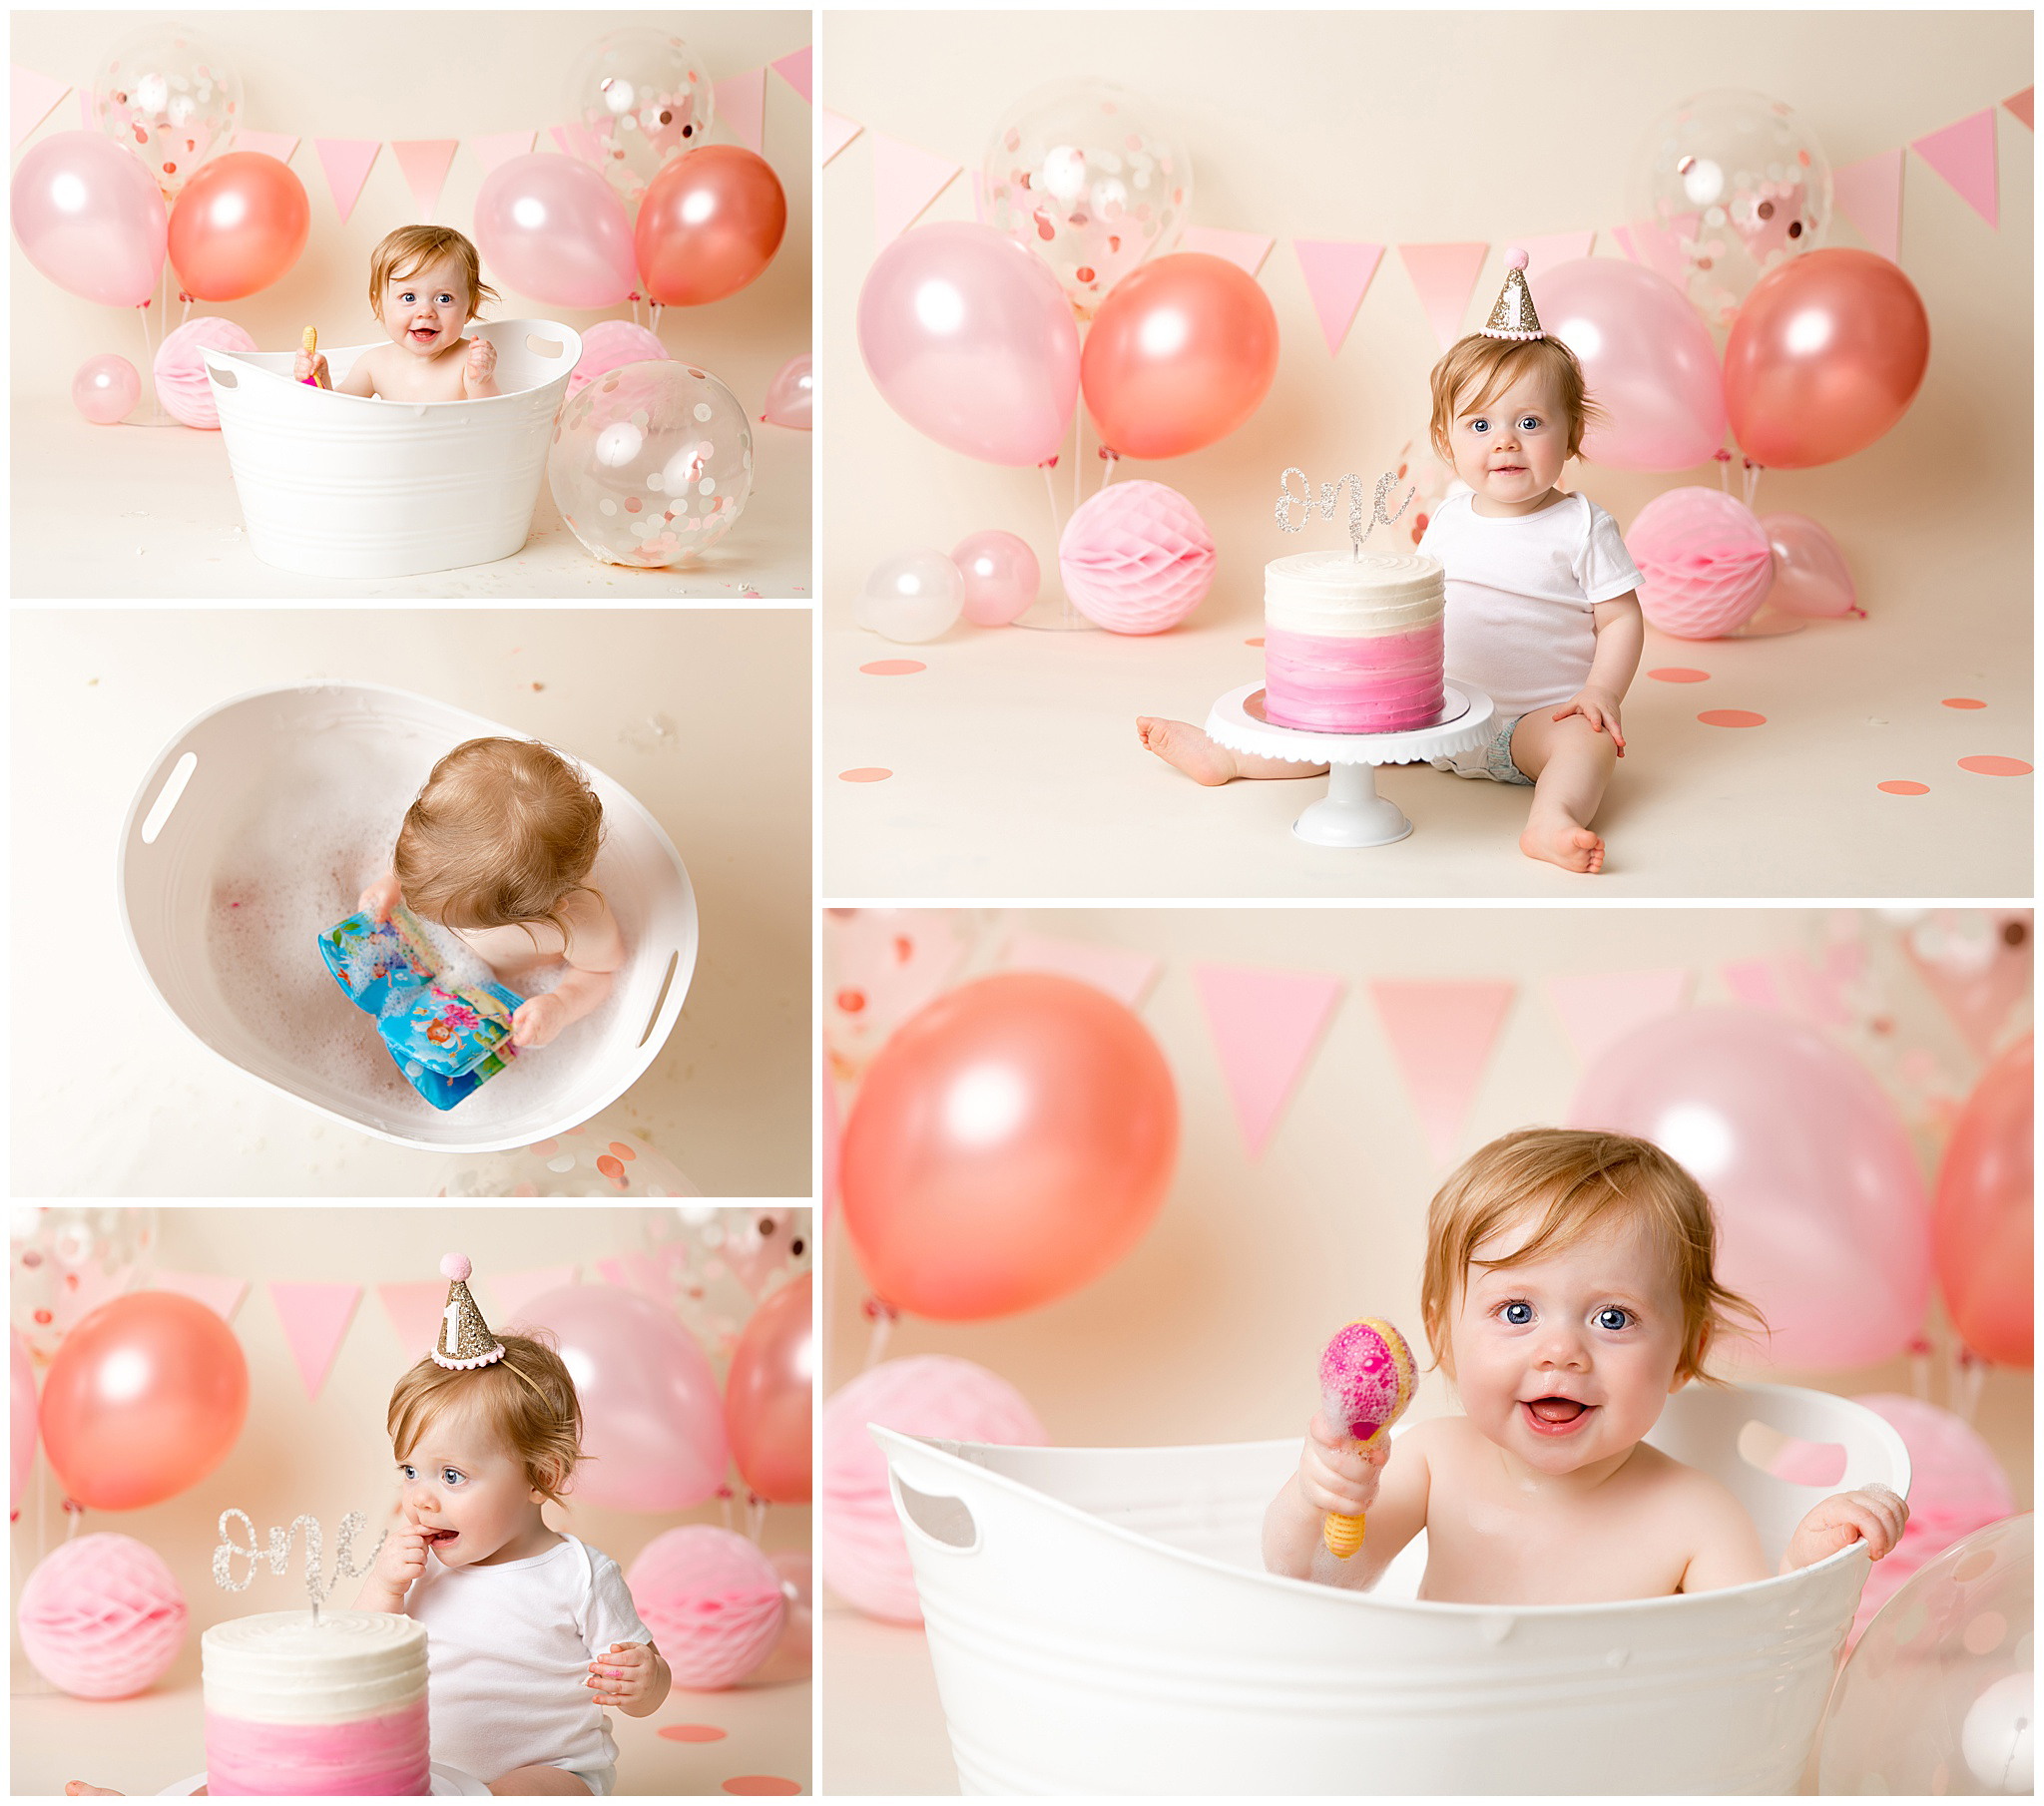 cakesmash+photography+Luciana+Golcman+NYC+53.jpg